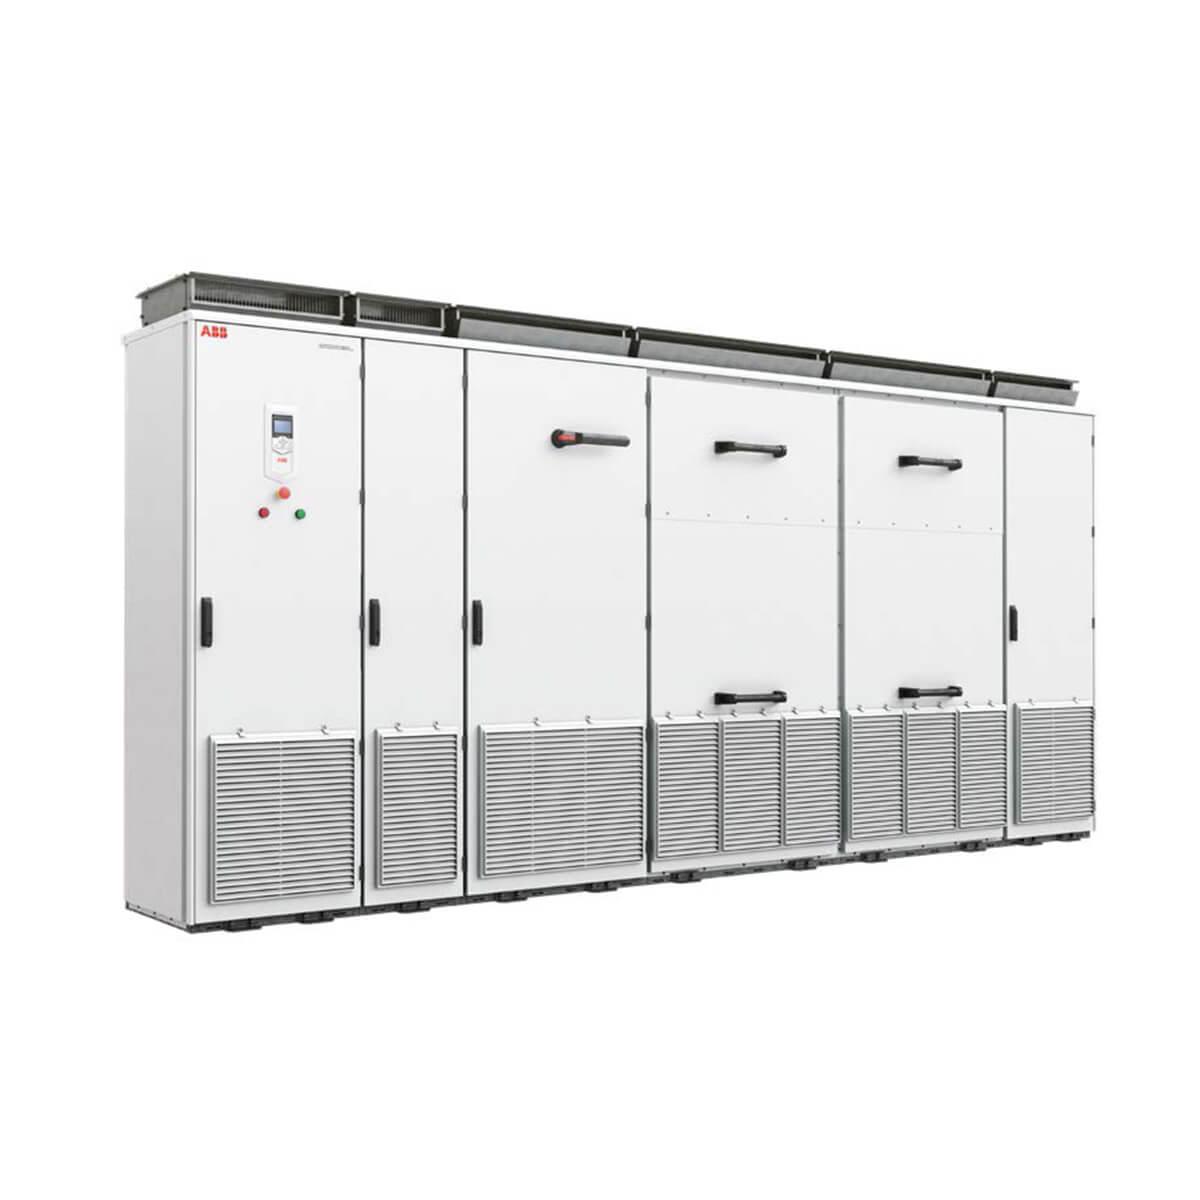 abb fimer 1645kW inverter, abb fimer pvs800 1645kW inverter, abb fimer pvs800-57b-1645kW-c inverter, abb fimer pvs800-57b-1645kW-c, abb fimer pvs800 1645 kW